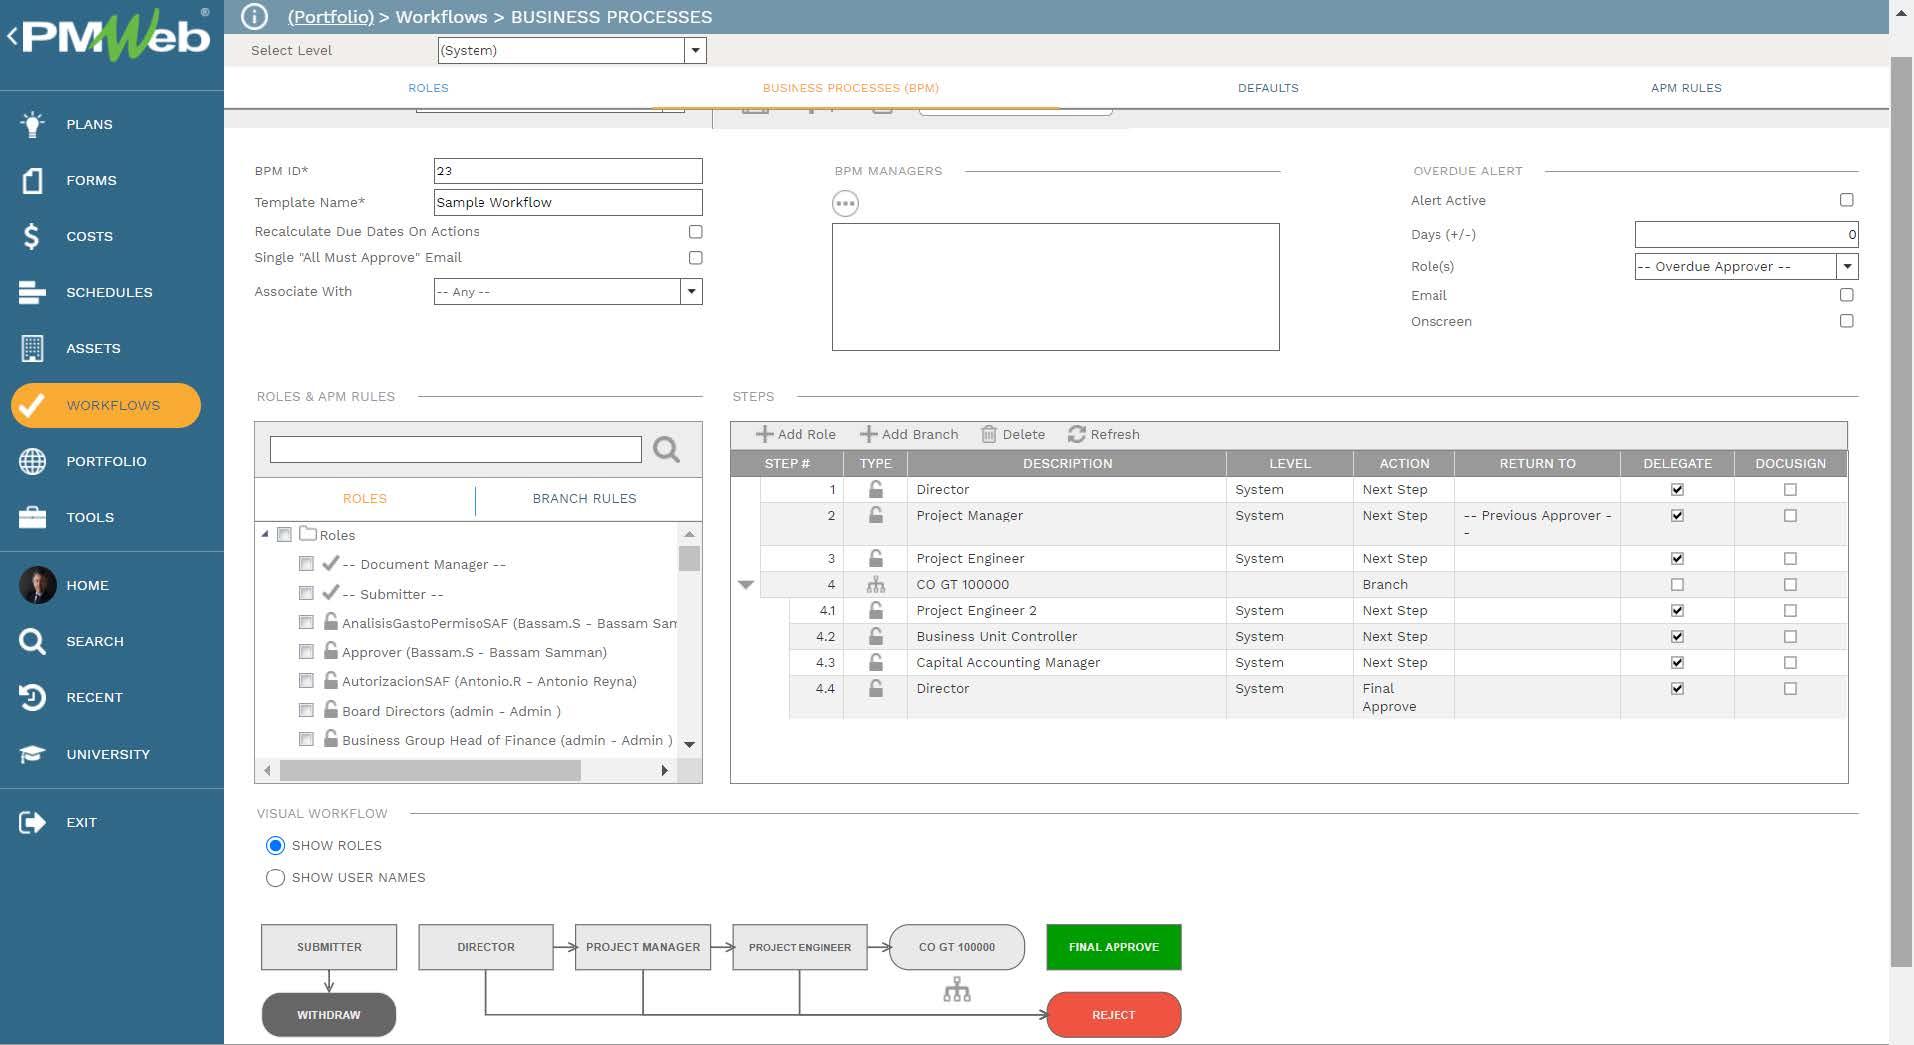 PMWeb 7 Workflow Business Processes (BPM)